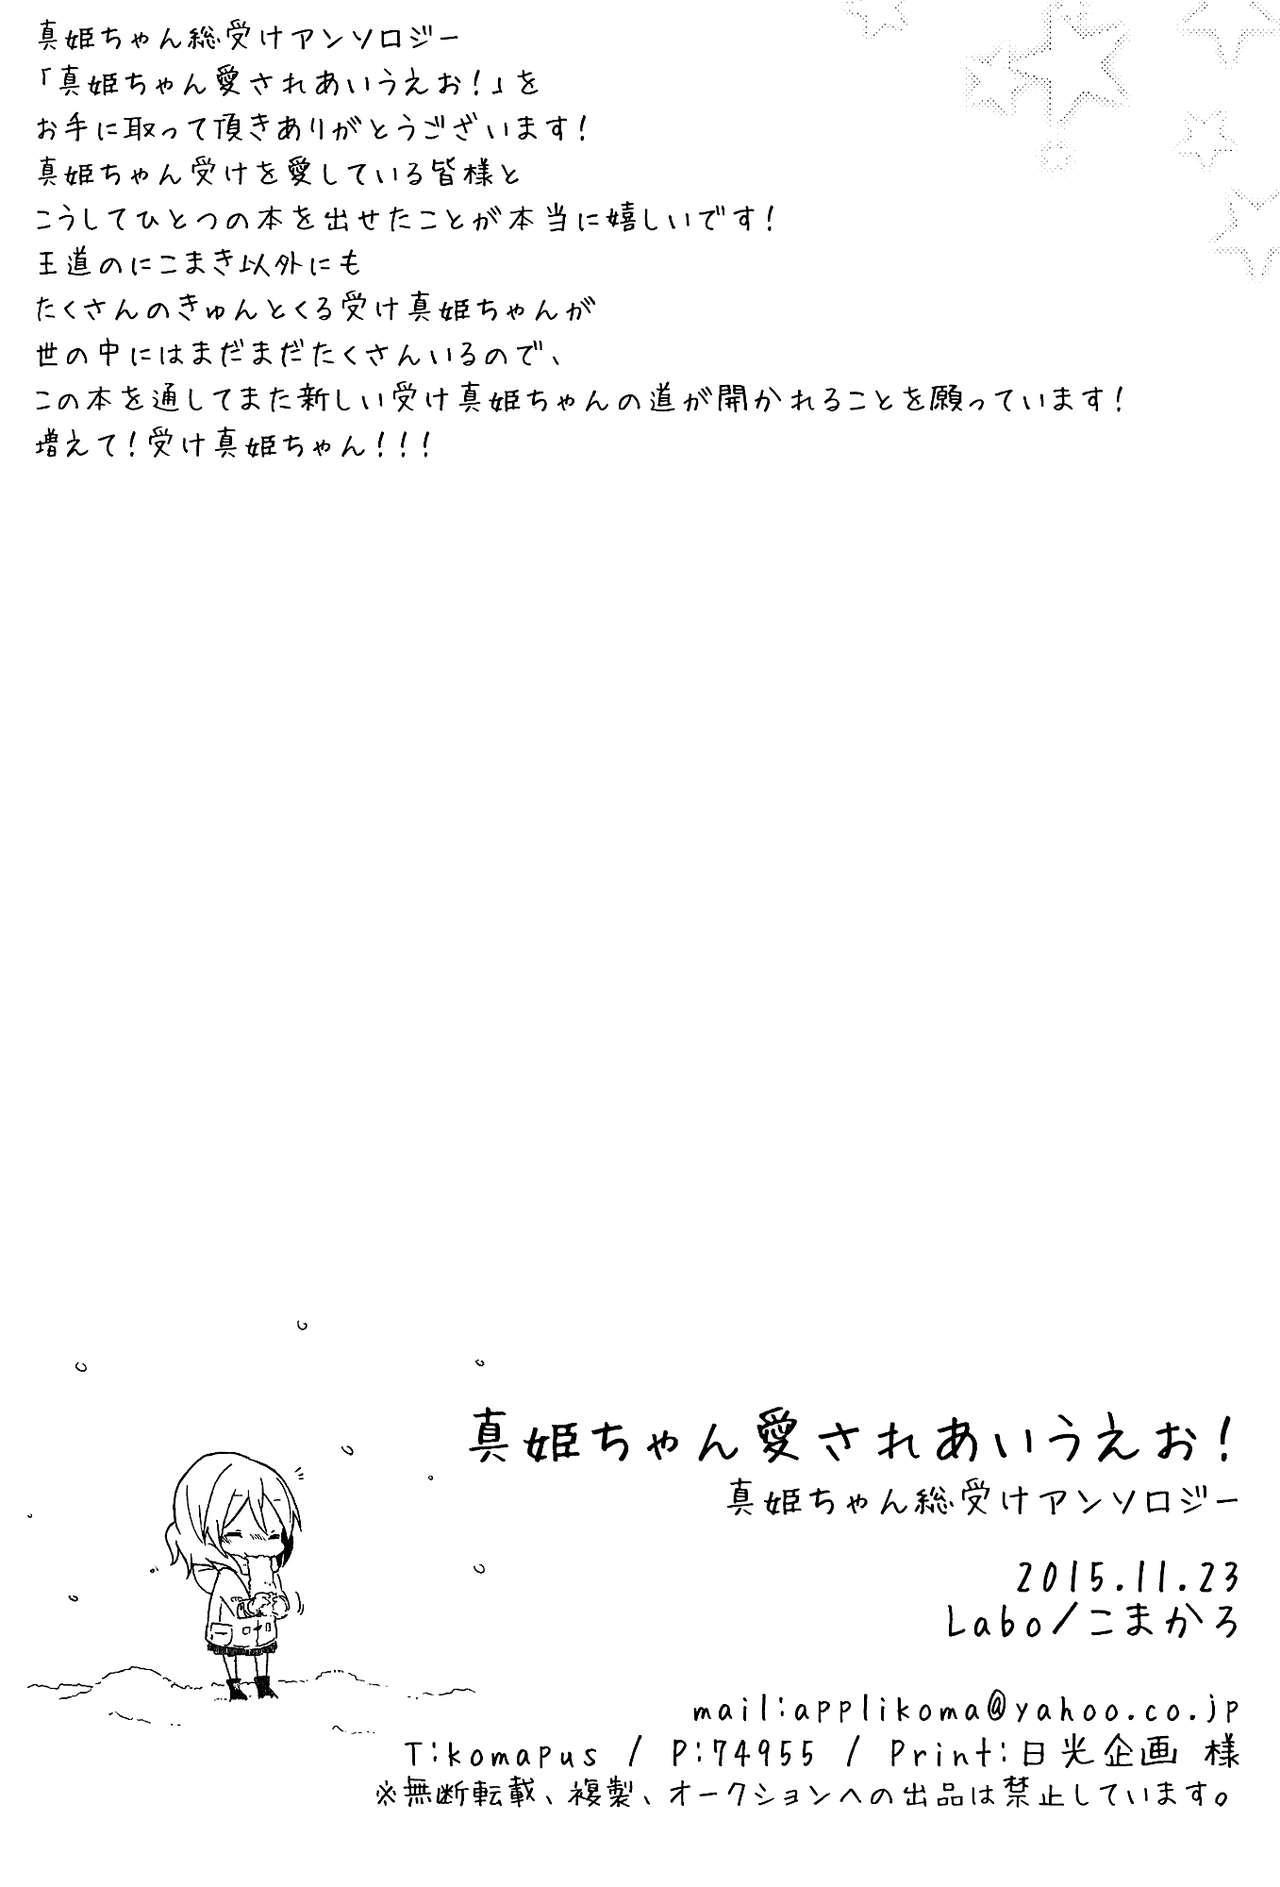 (Bokura no Love Live! 10) [Labo (Various)] Maki-chan Aisare aiueo!   Maki-chan Loved Alphabetically! (Love Live!) [English] {/u/ scanlations} [Incomplete] 37